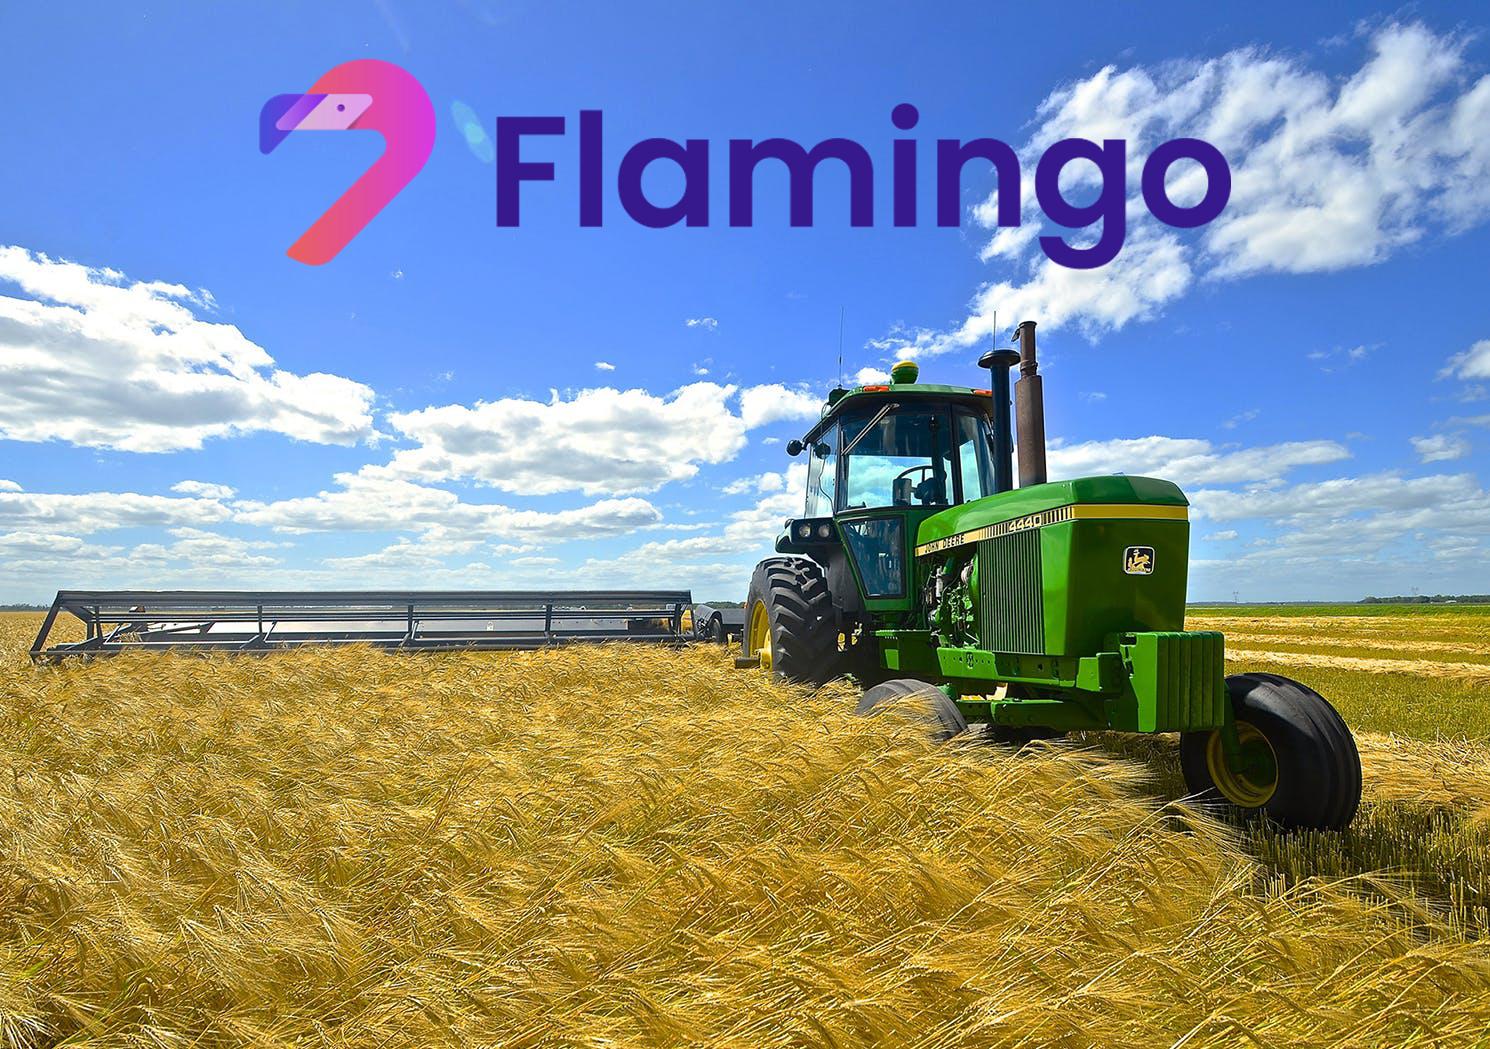 flamincome yield farming